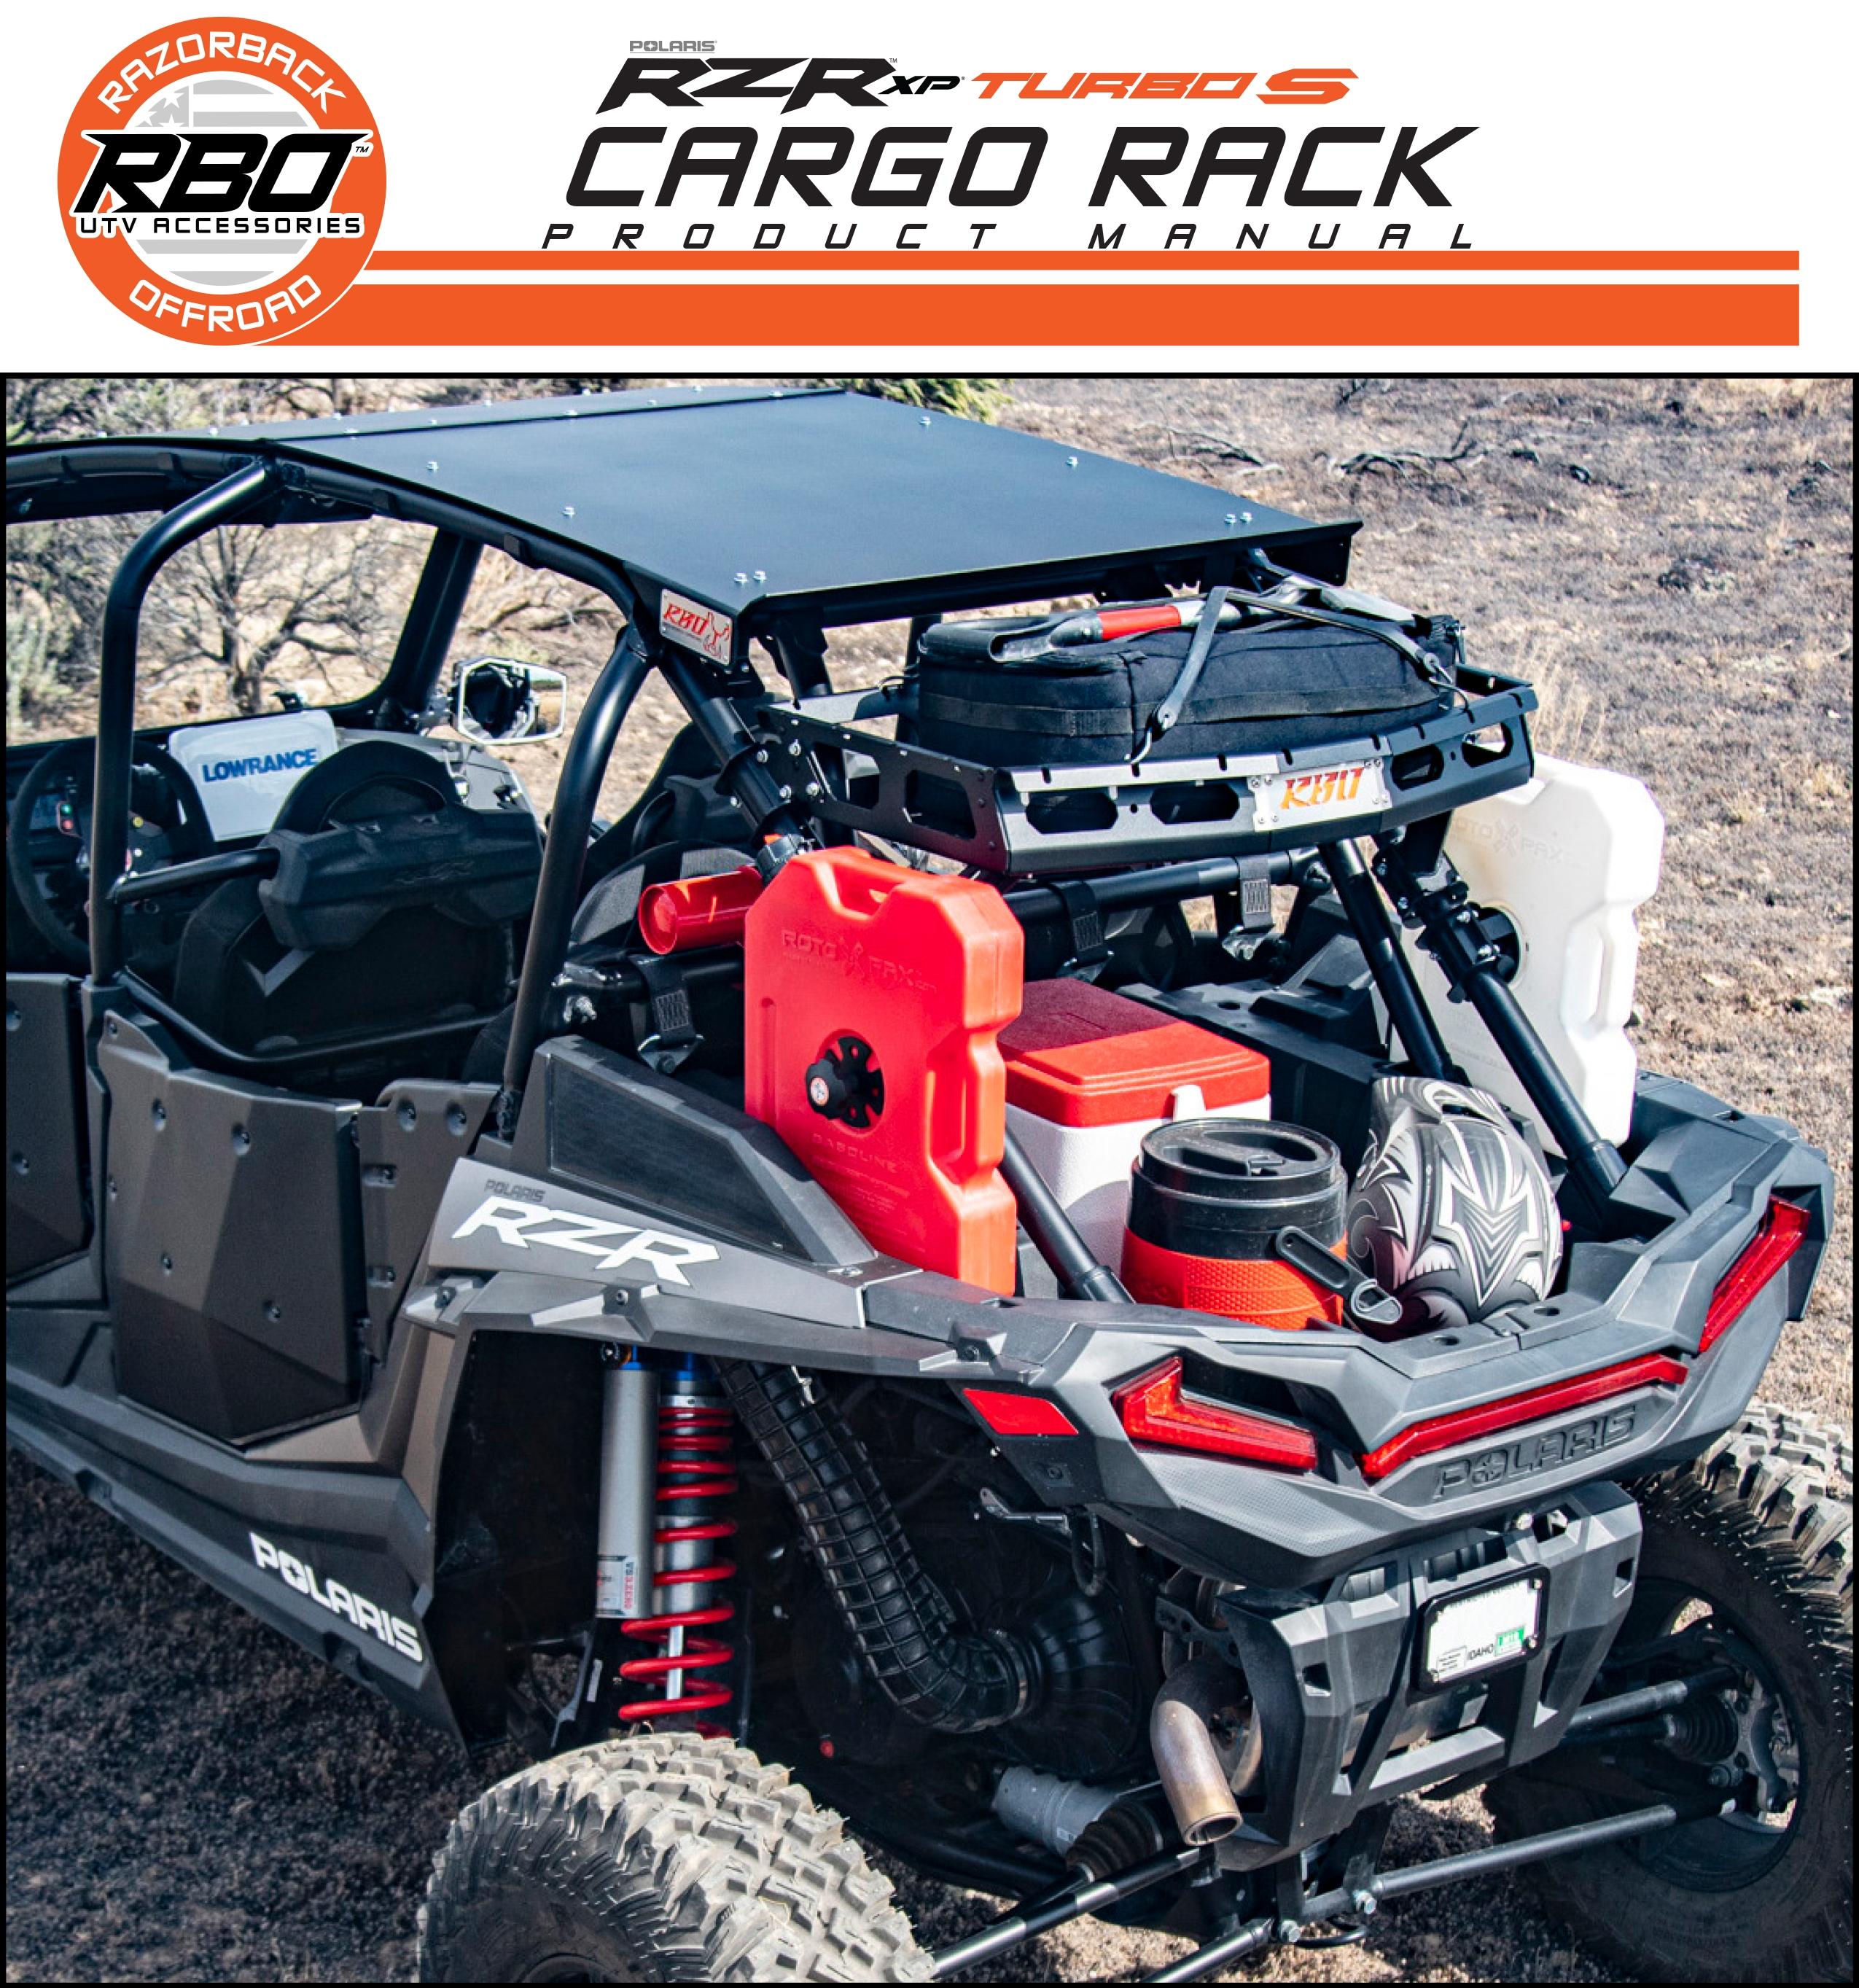 RBO Polaris Turbo S Cargo Rack Product Manual